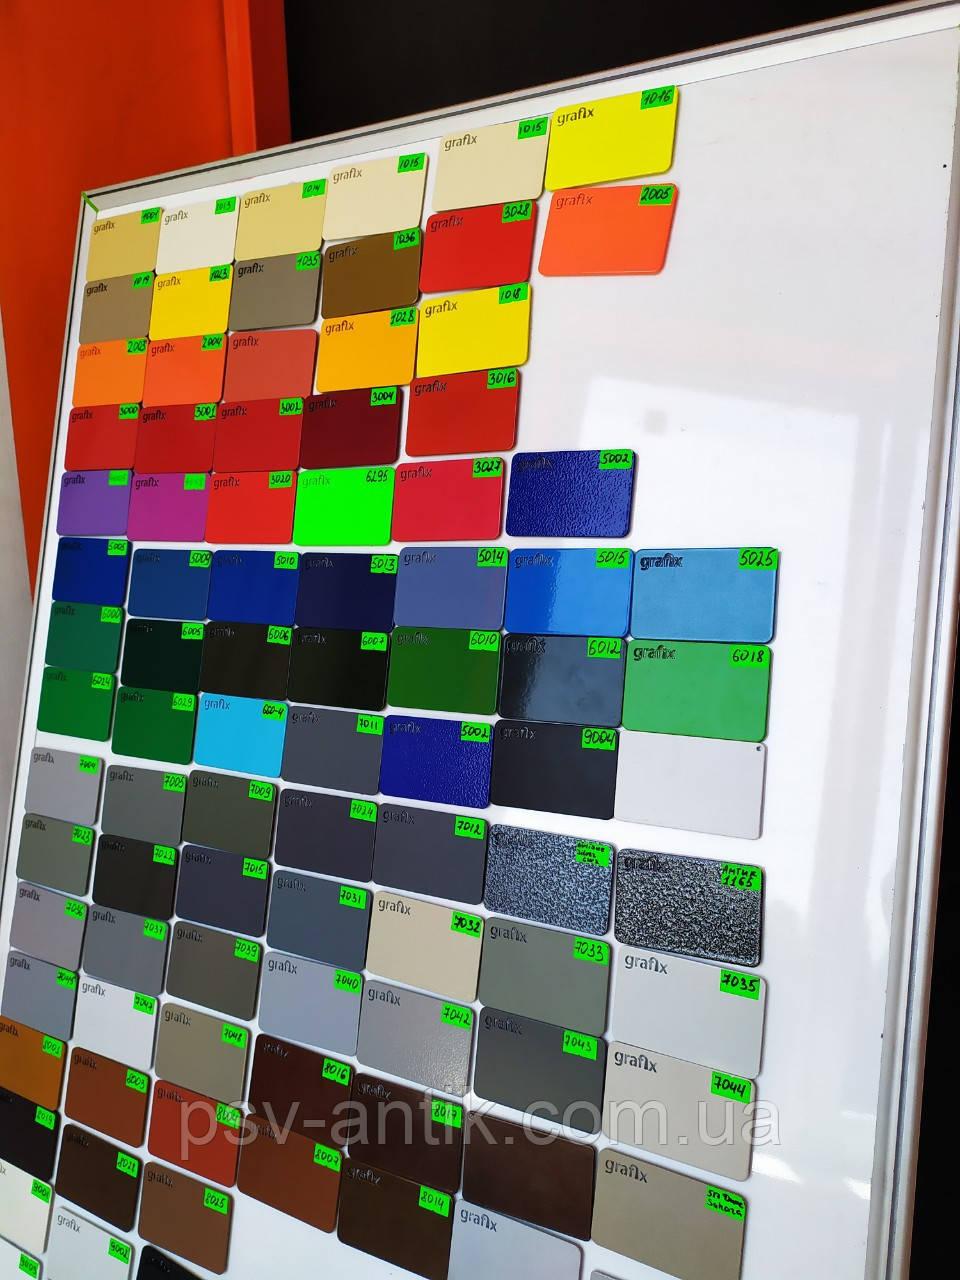 Порошковая краска глянцевая, полиэфирная, архитектурная, 9003